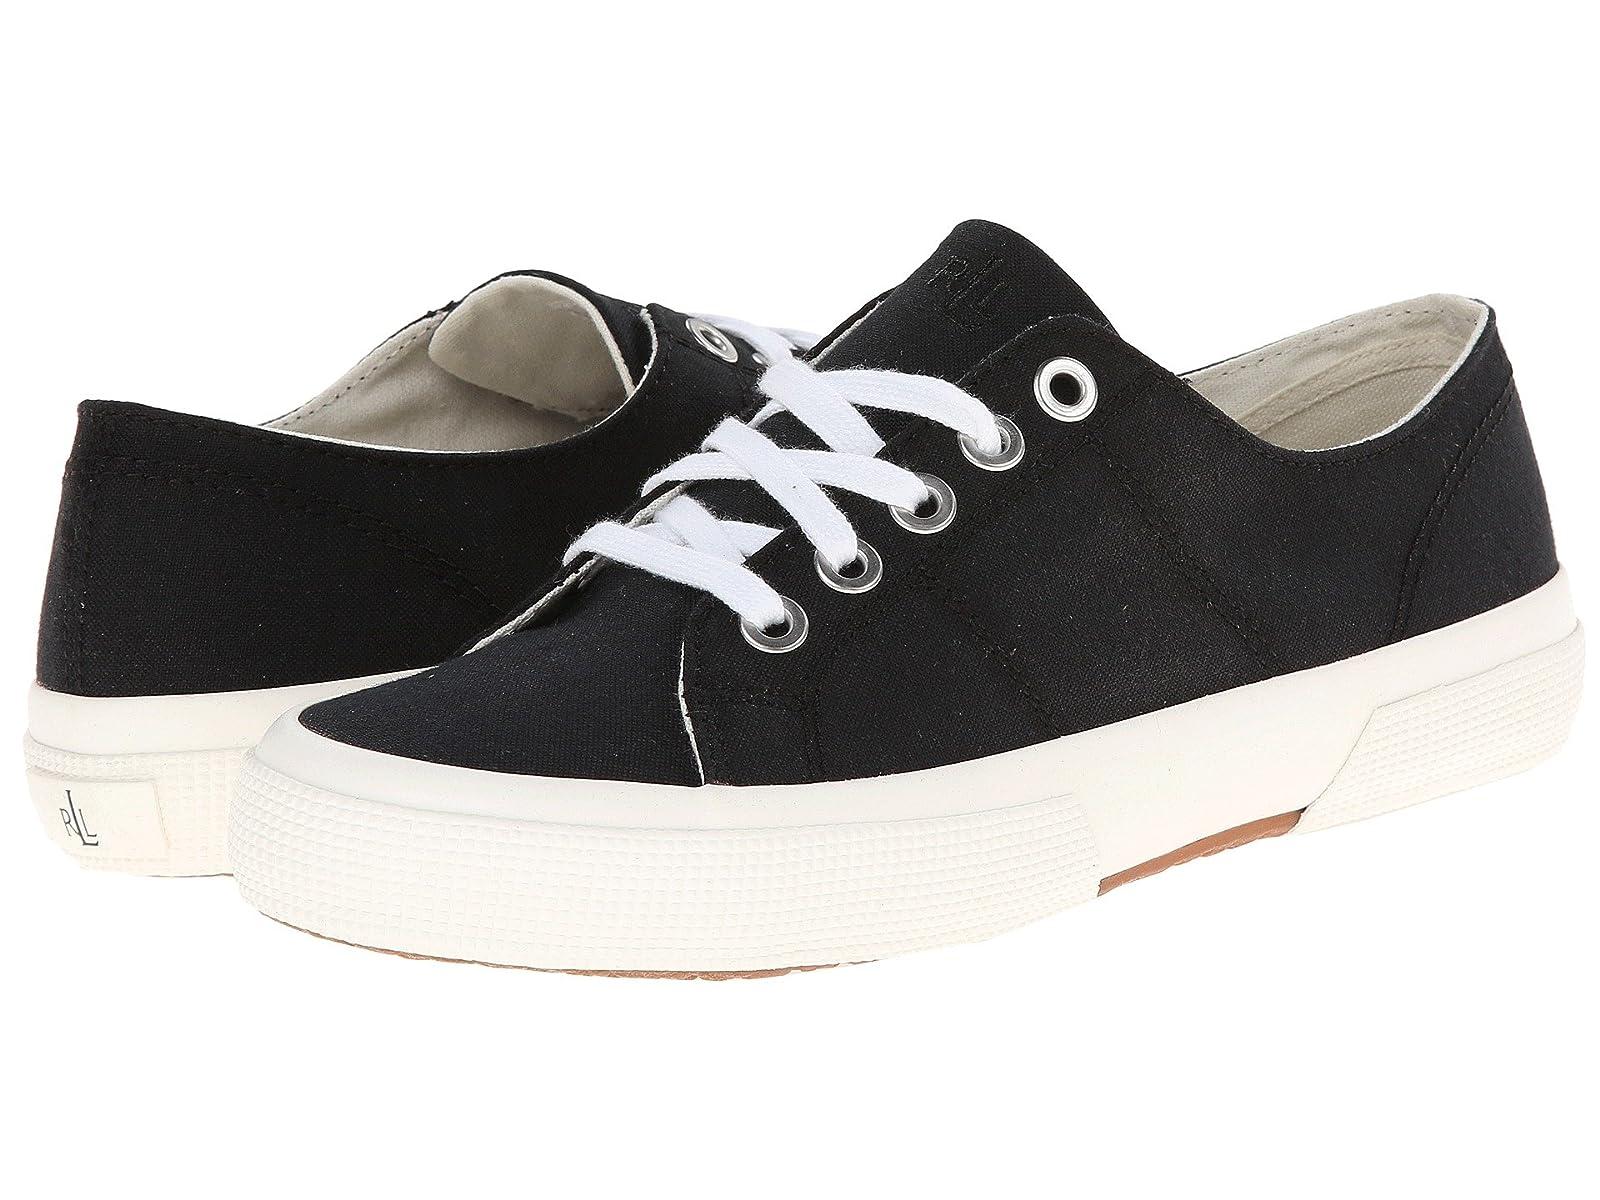 LAUREN Ralph Lauren JolieAtmospheric grades have affordable shoes